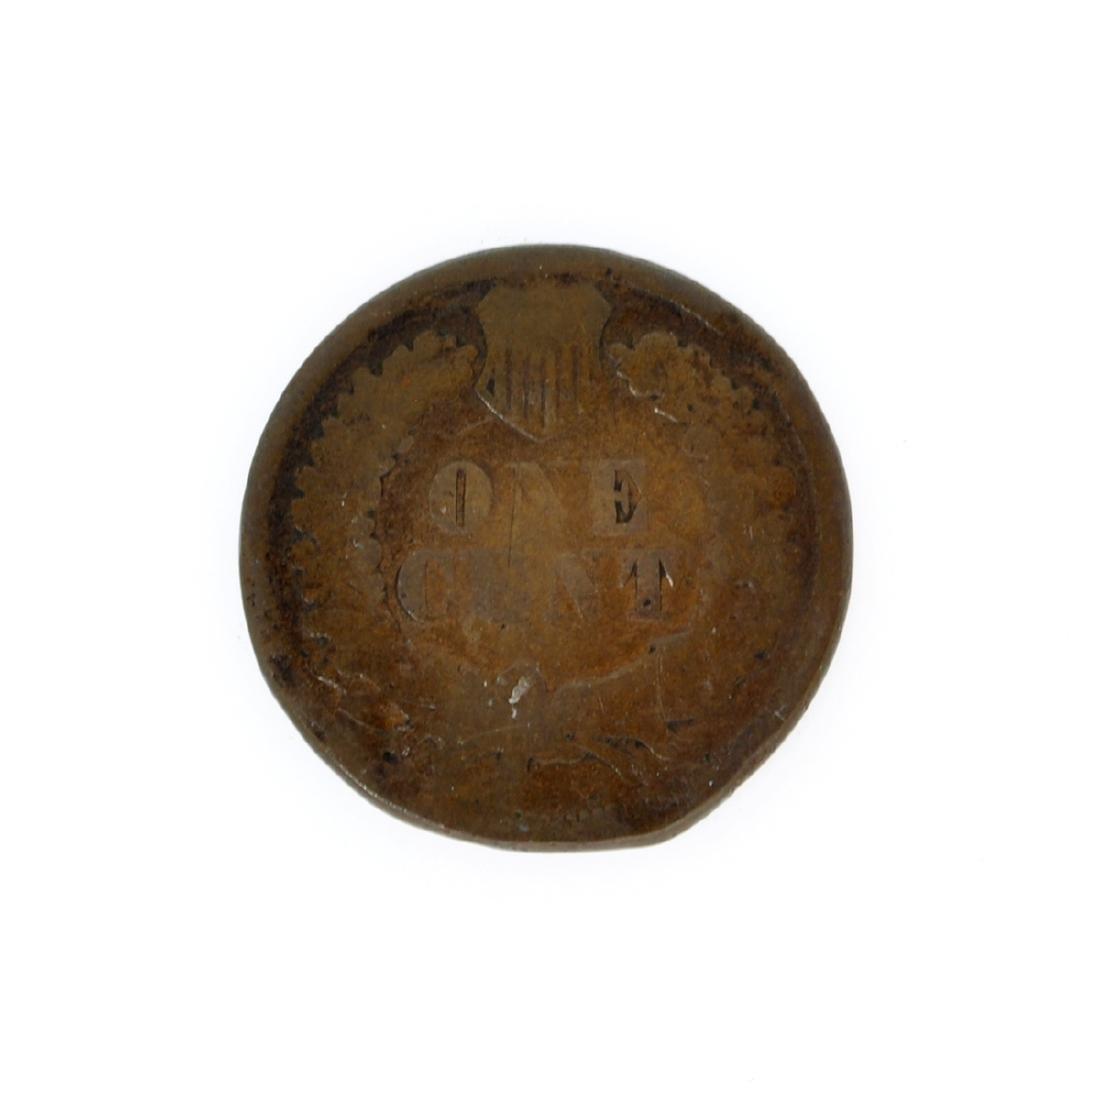 Rare 1877 Indian Cent Coin - 2